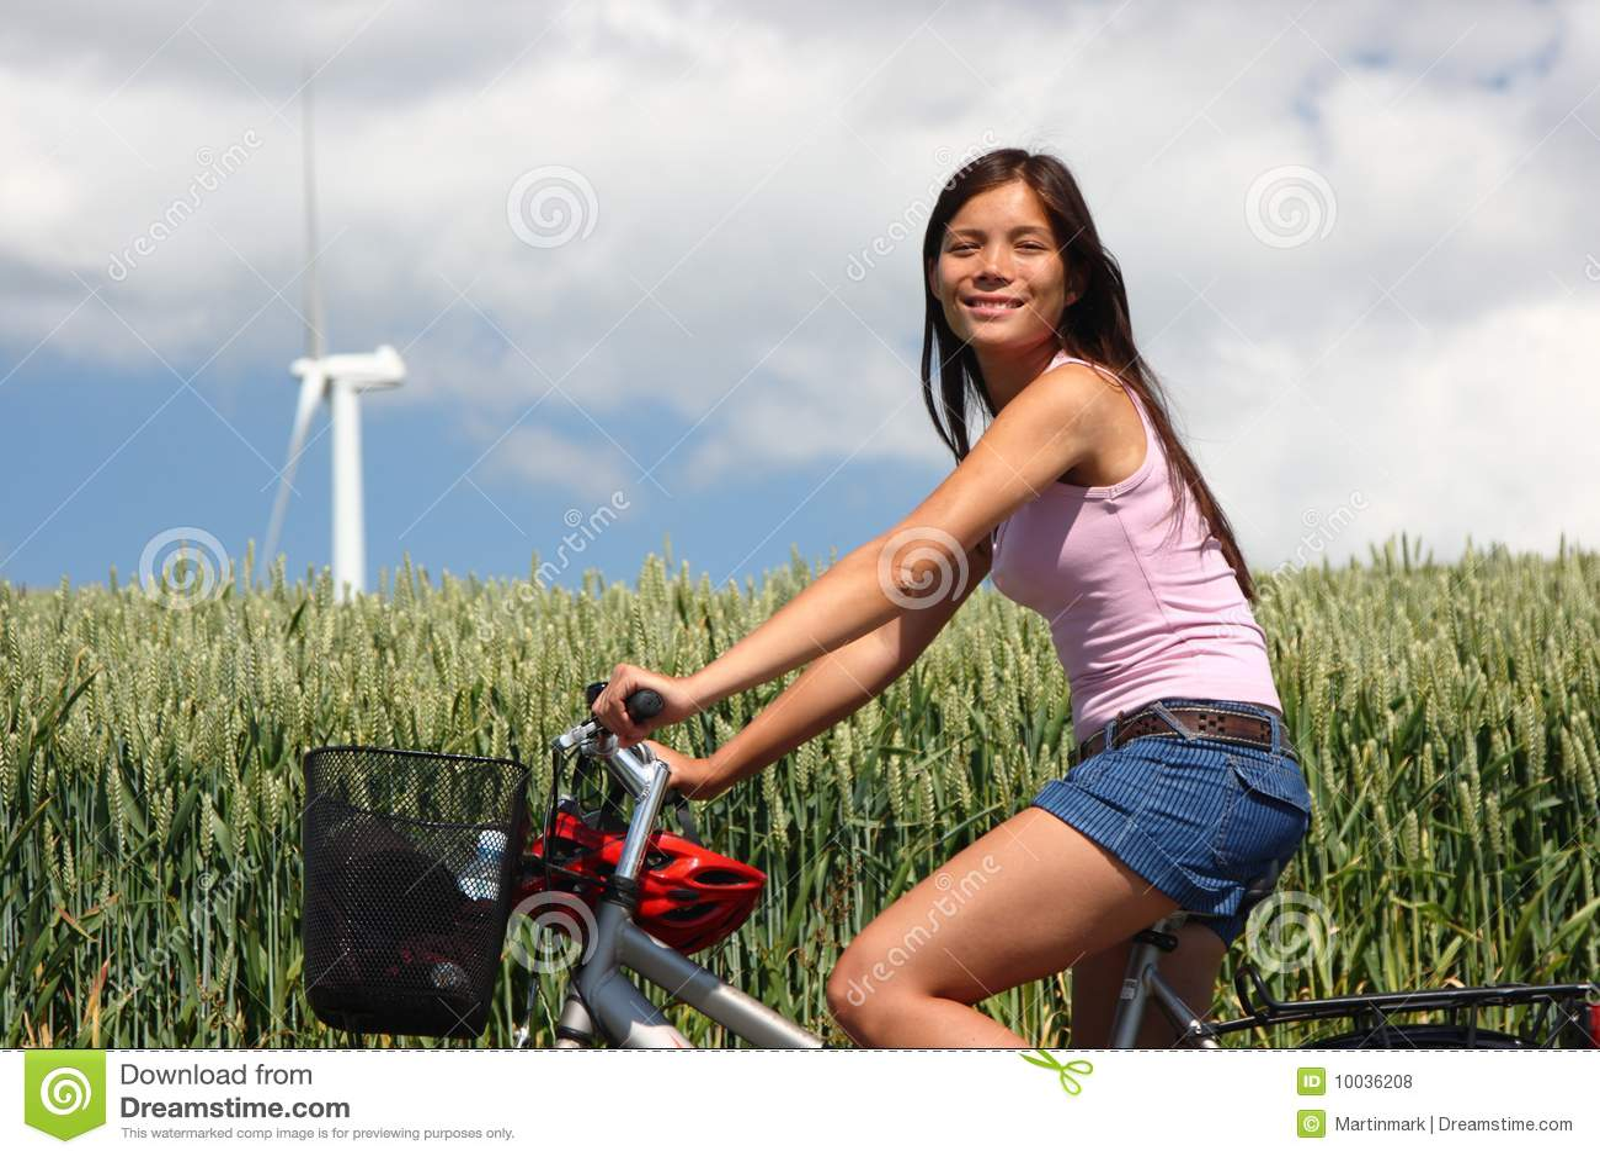 Denmark Woman Biking Royalty Free Stock Photos Image